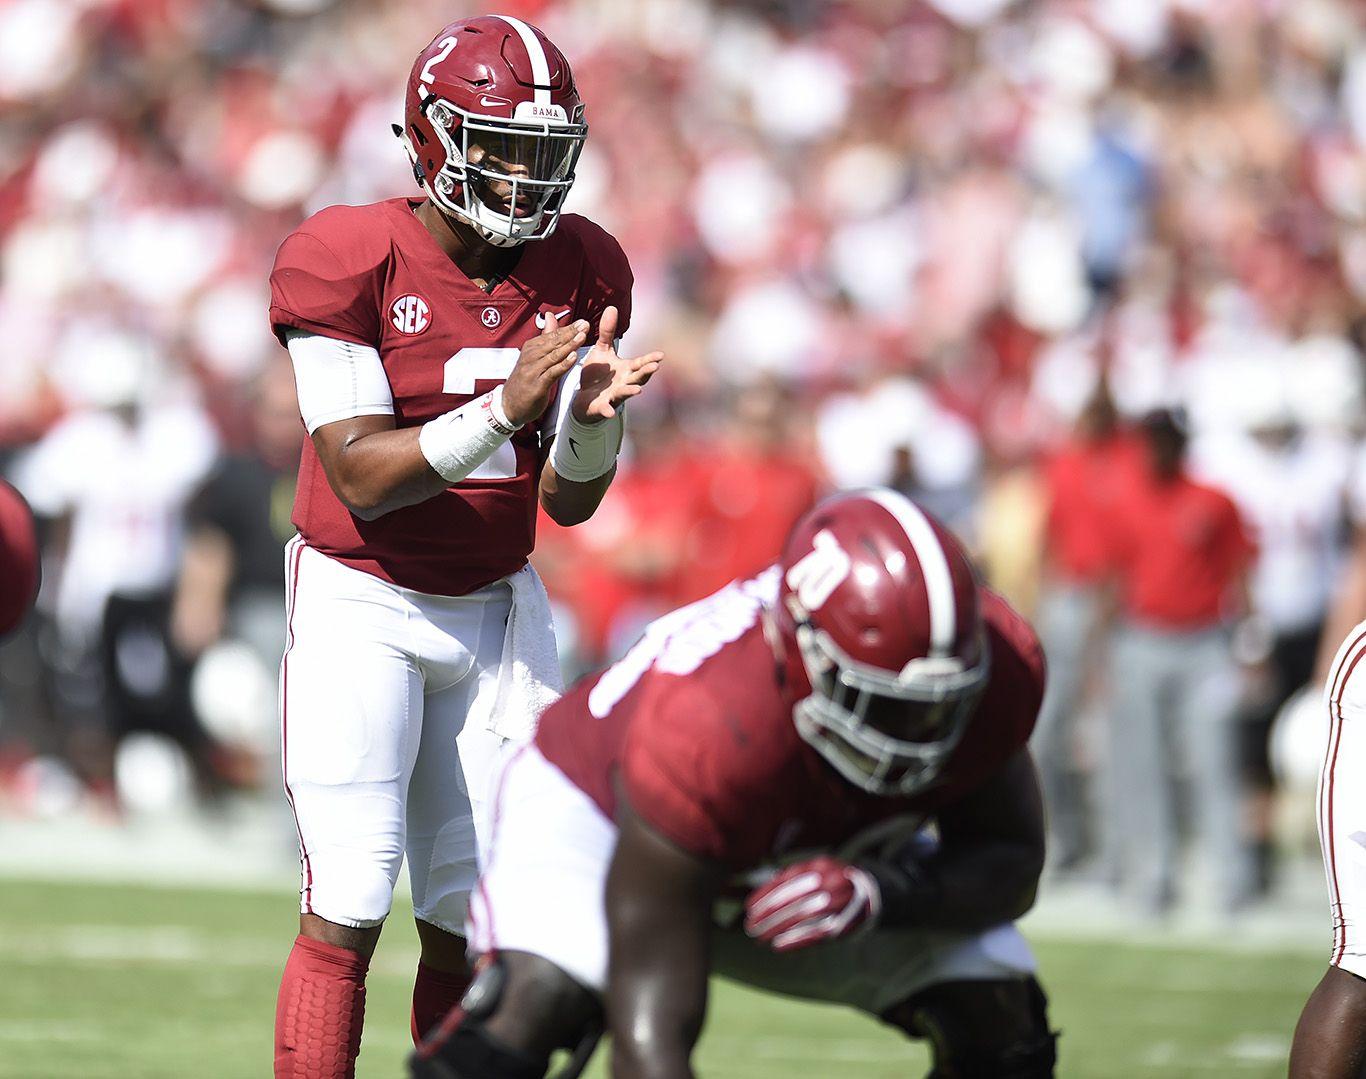 Alabama practice report Updates on 2 injured players